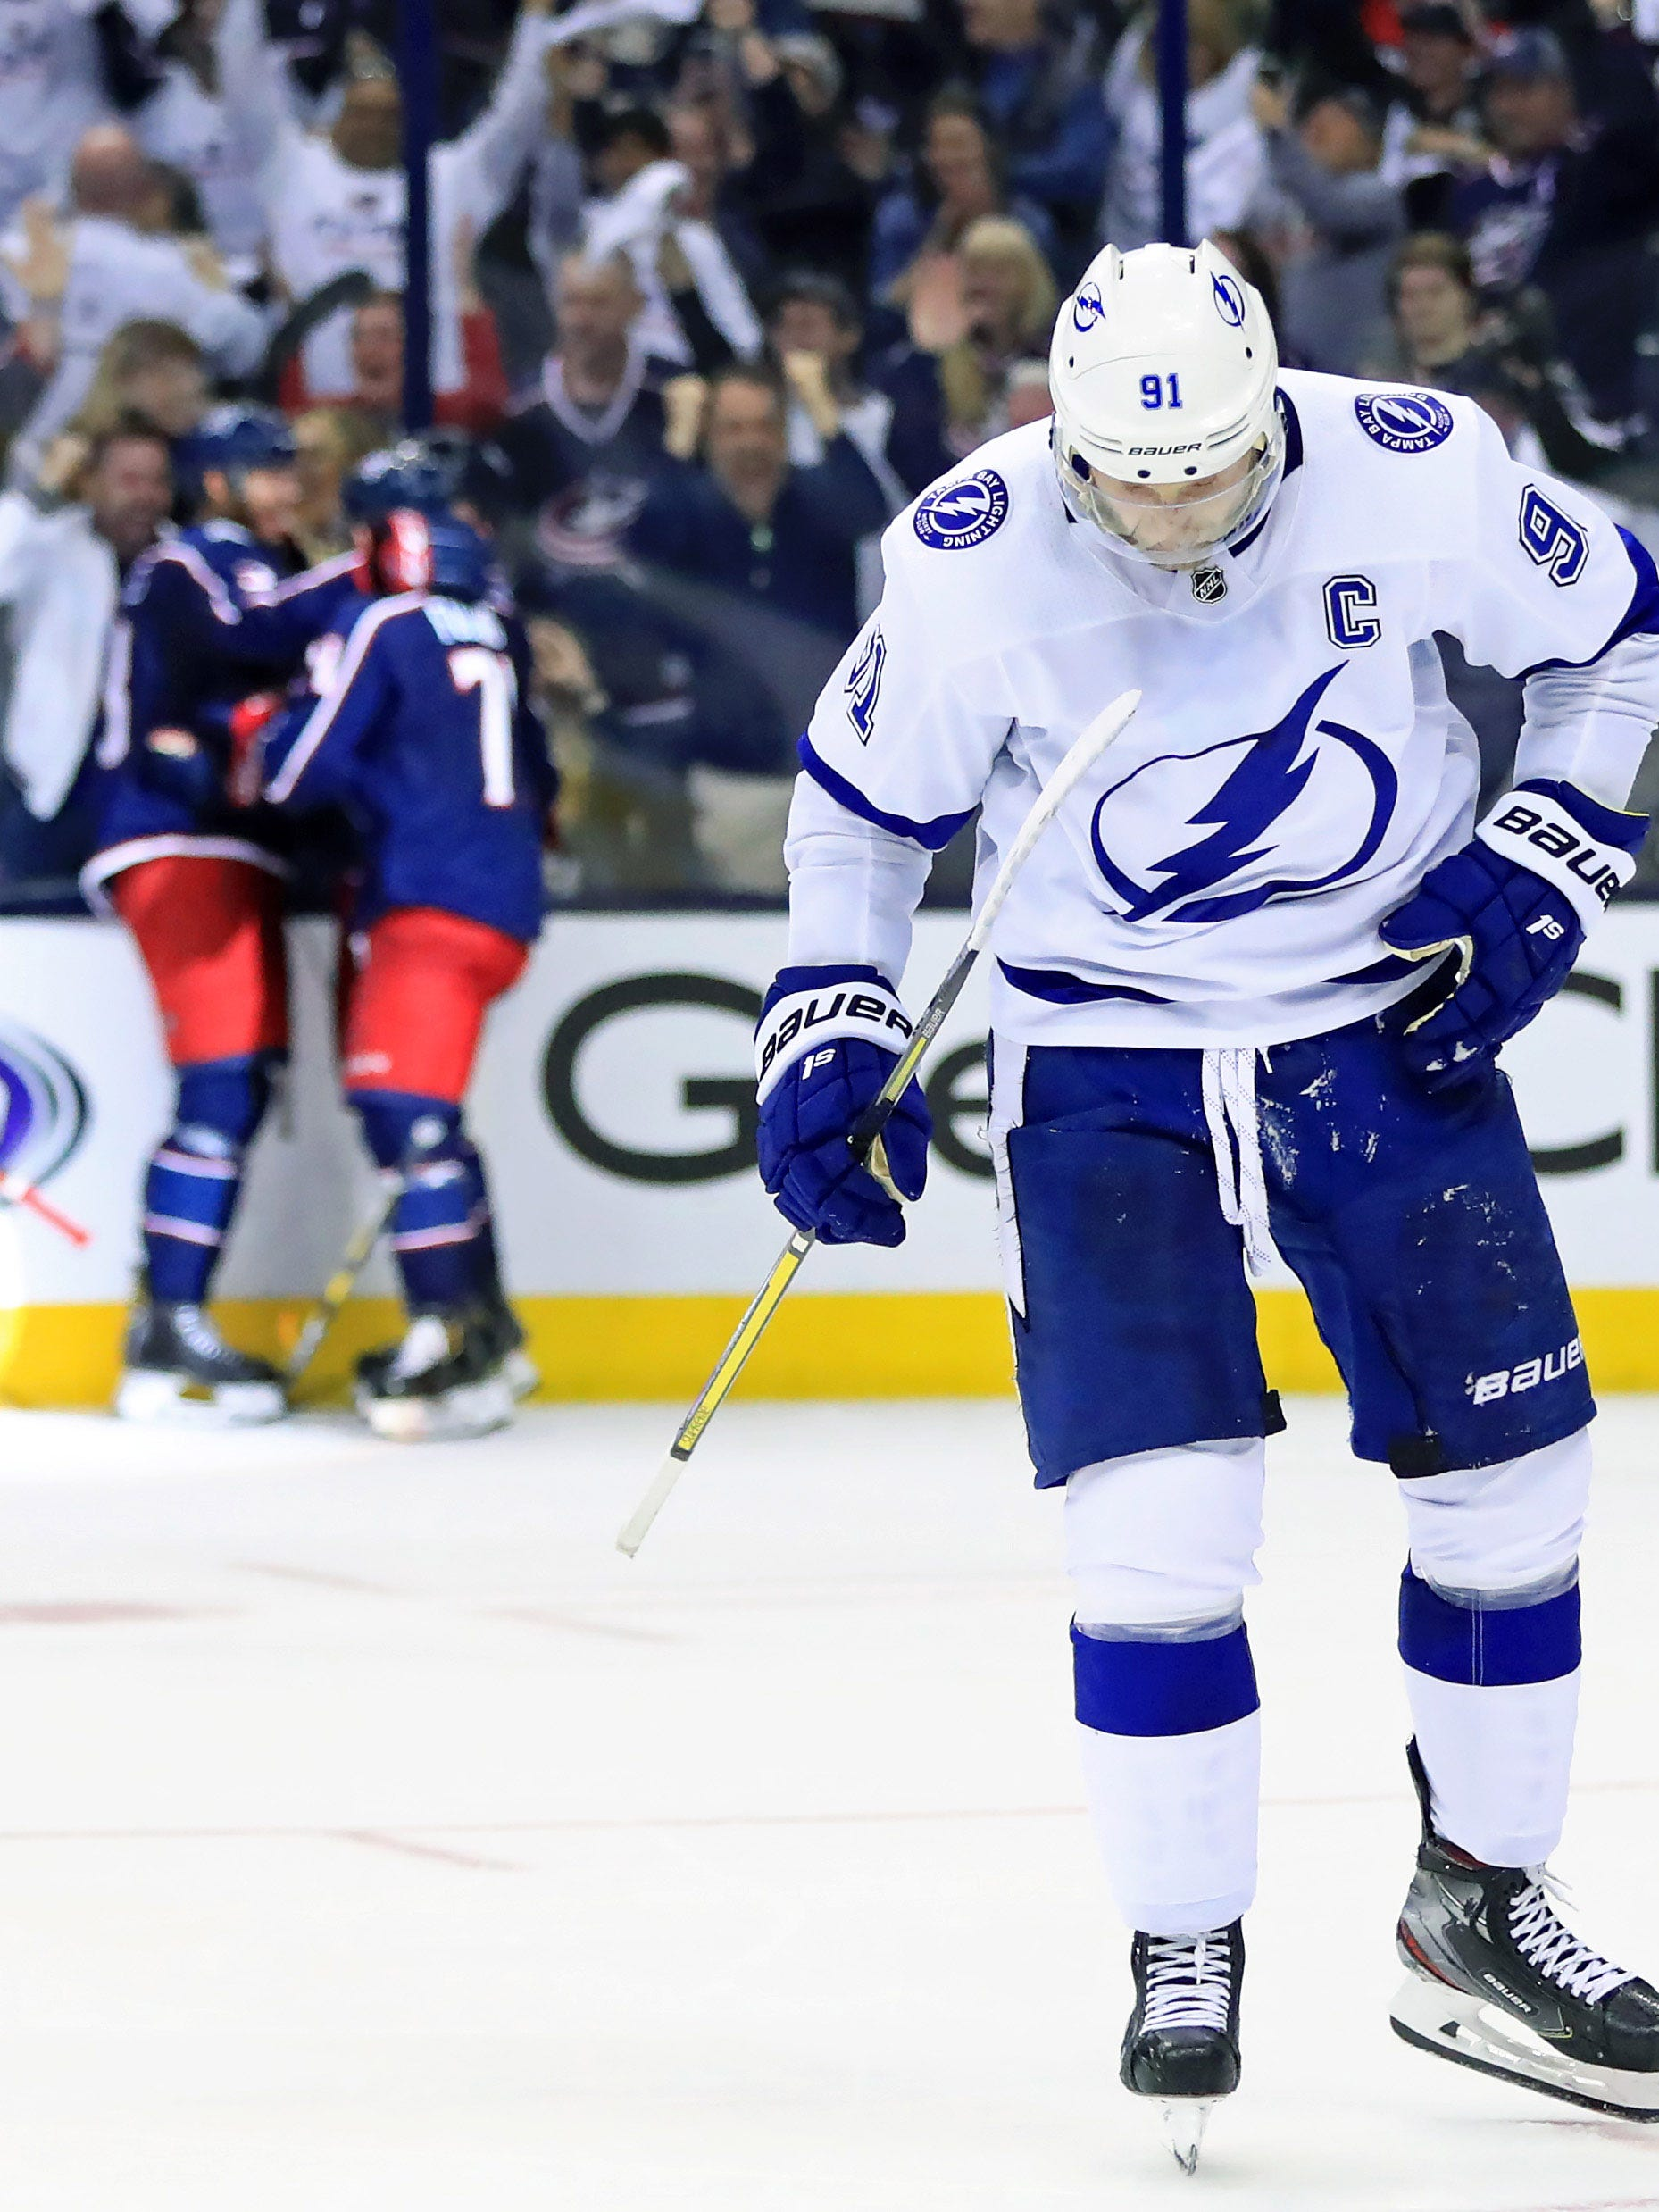 Lightning center Steven Stamkos skates away as the Blue Jackets celebrate a third-period goal.